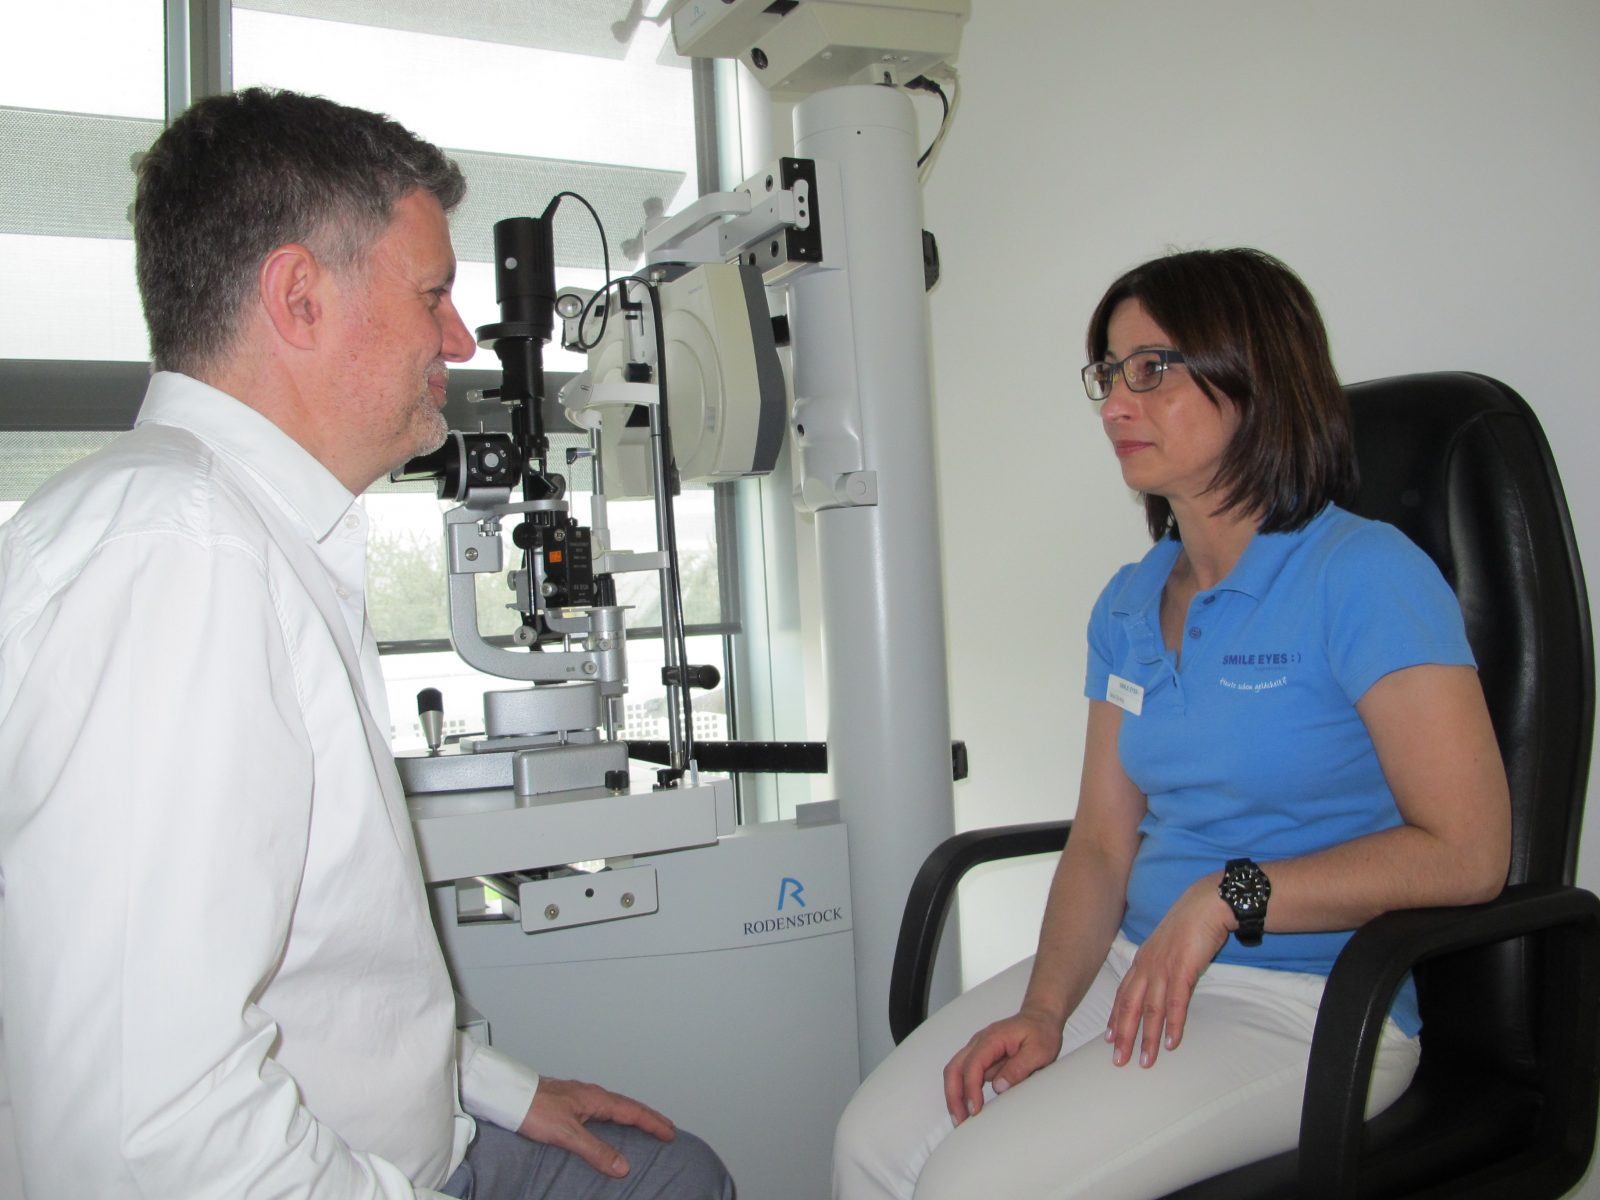 Tanja Spang vom Smile Eyes Team im Gespräch mit Augenarzt Dr. Wiltfang